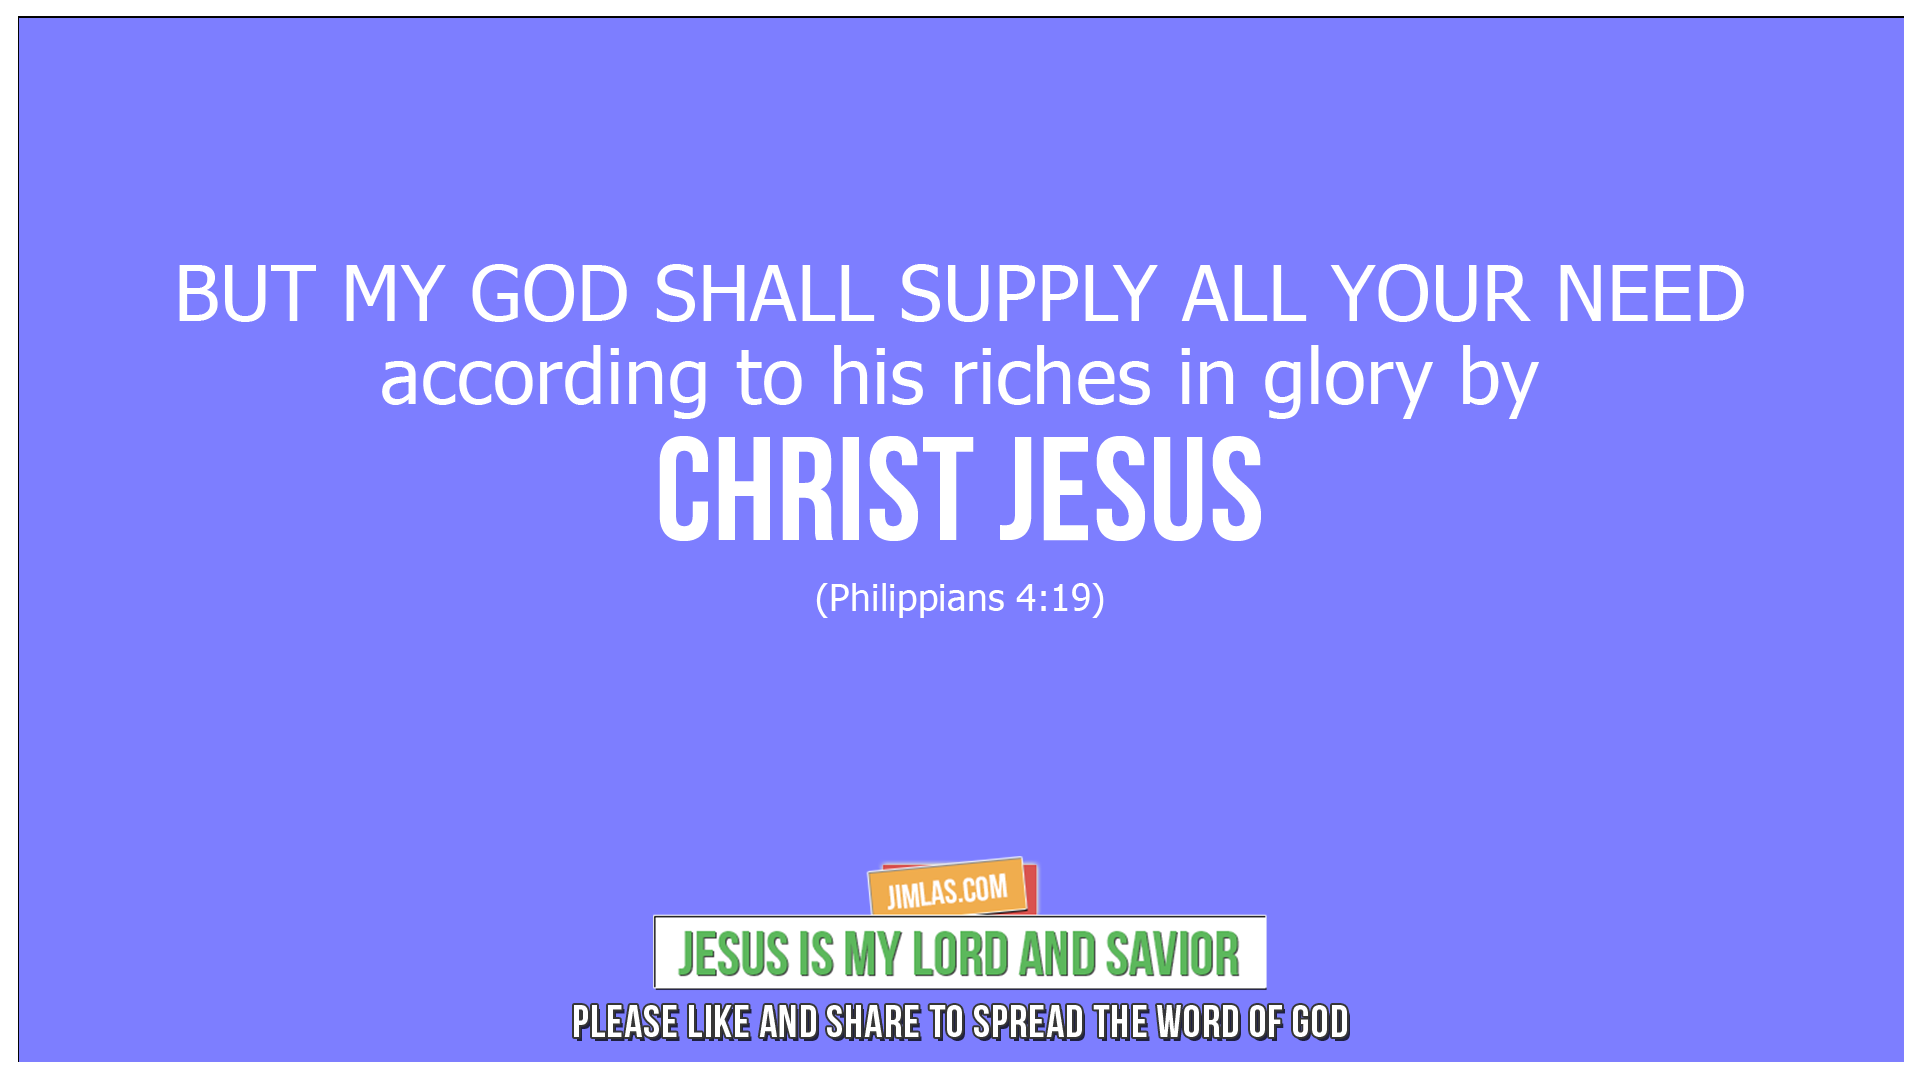 philippians 4 19, Philippians 4:19